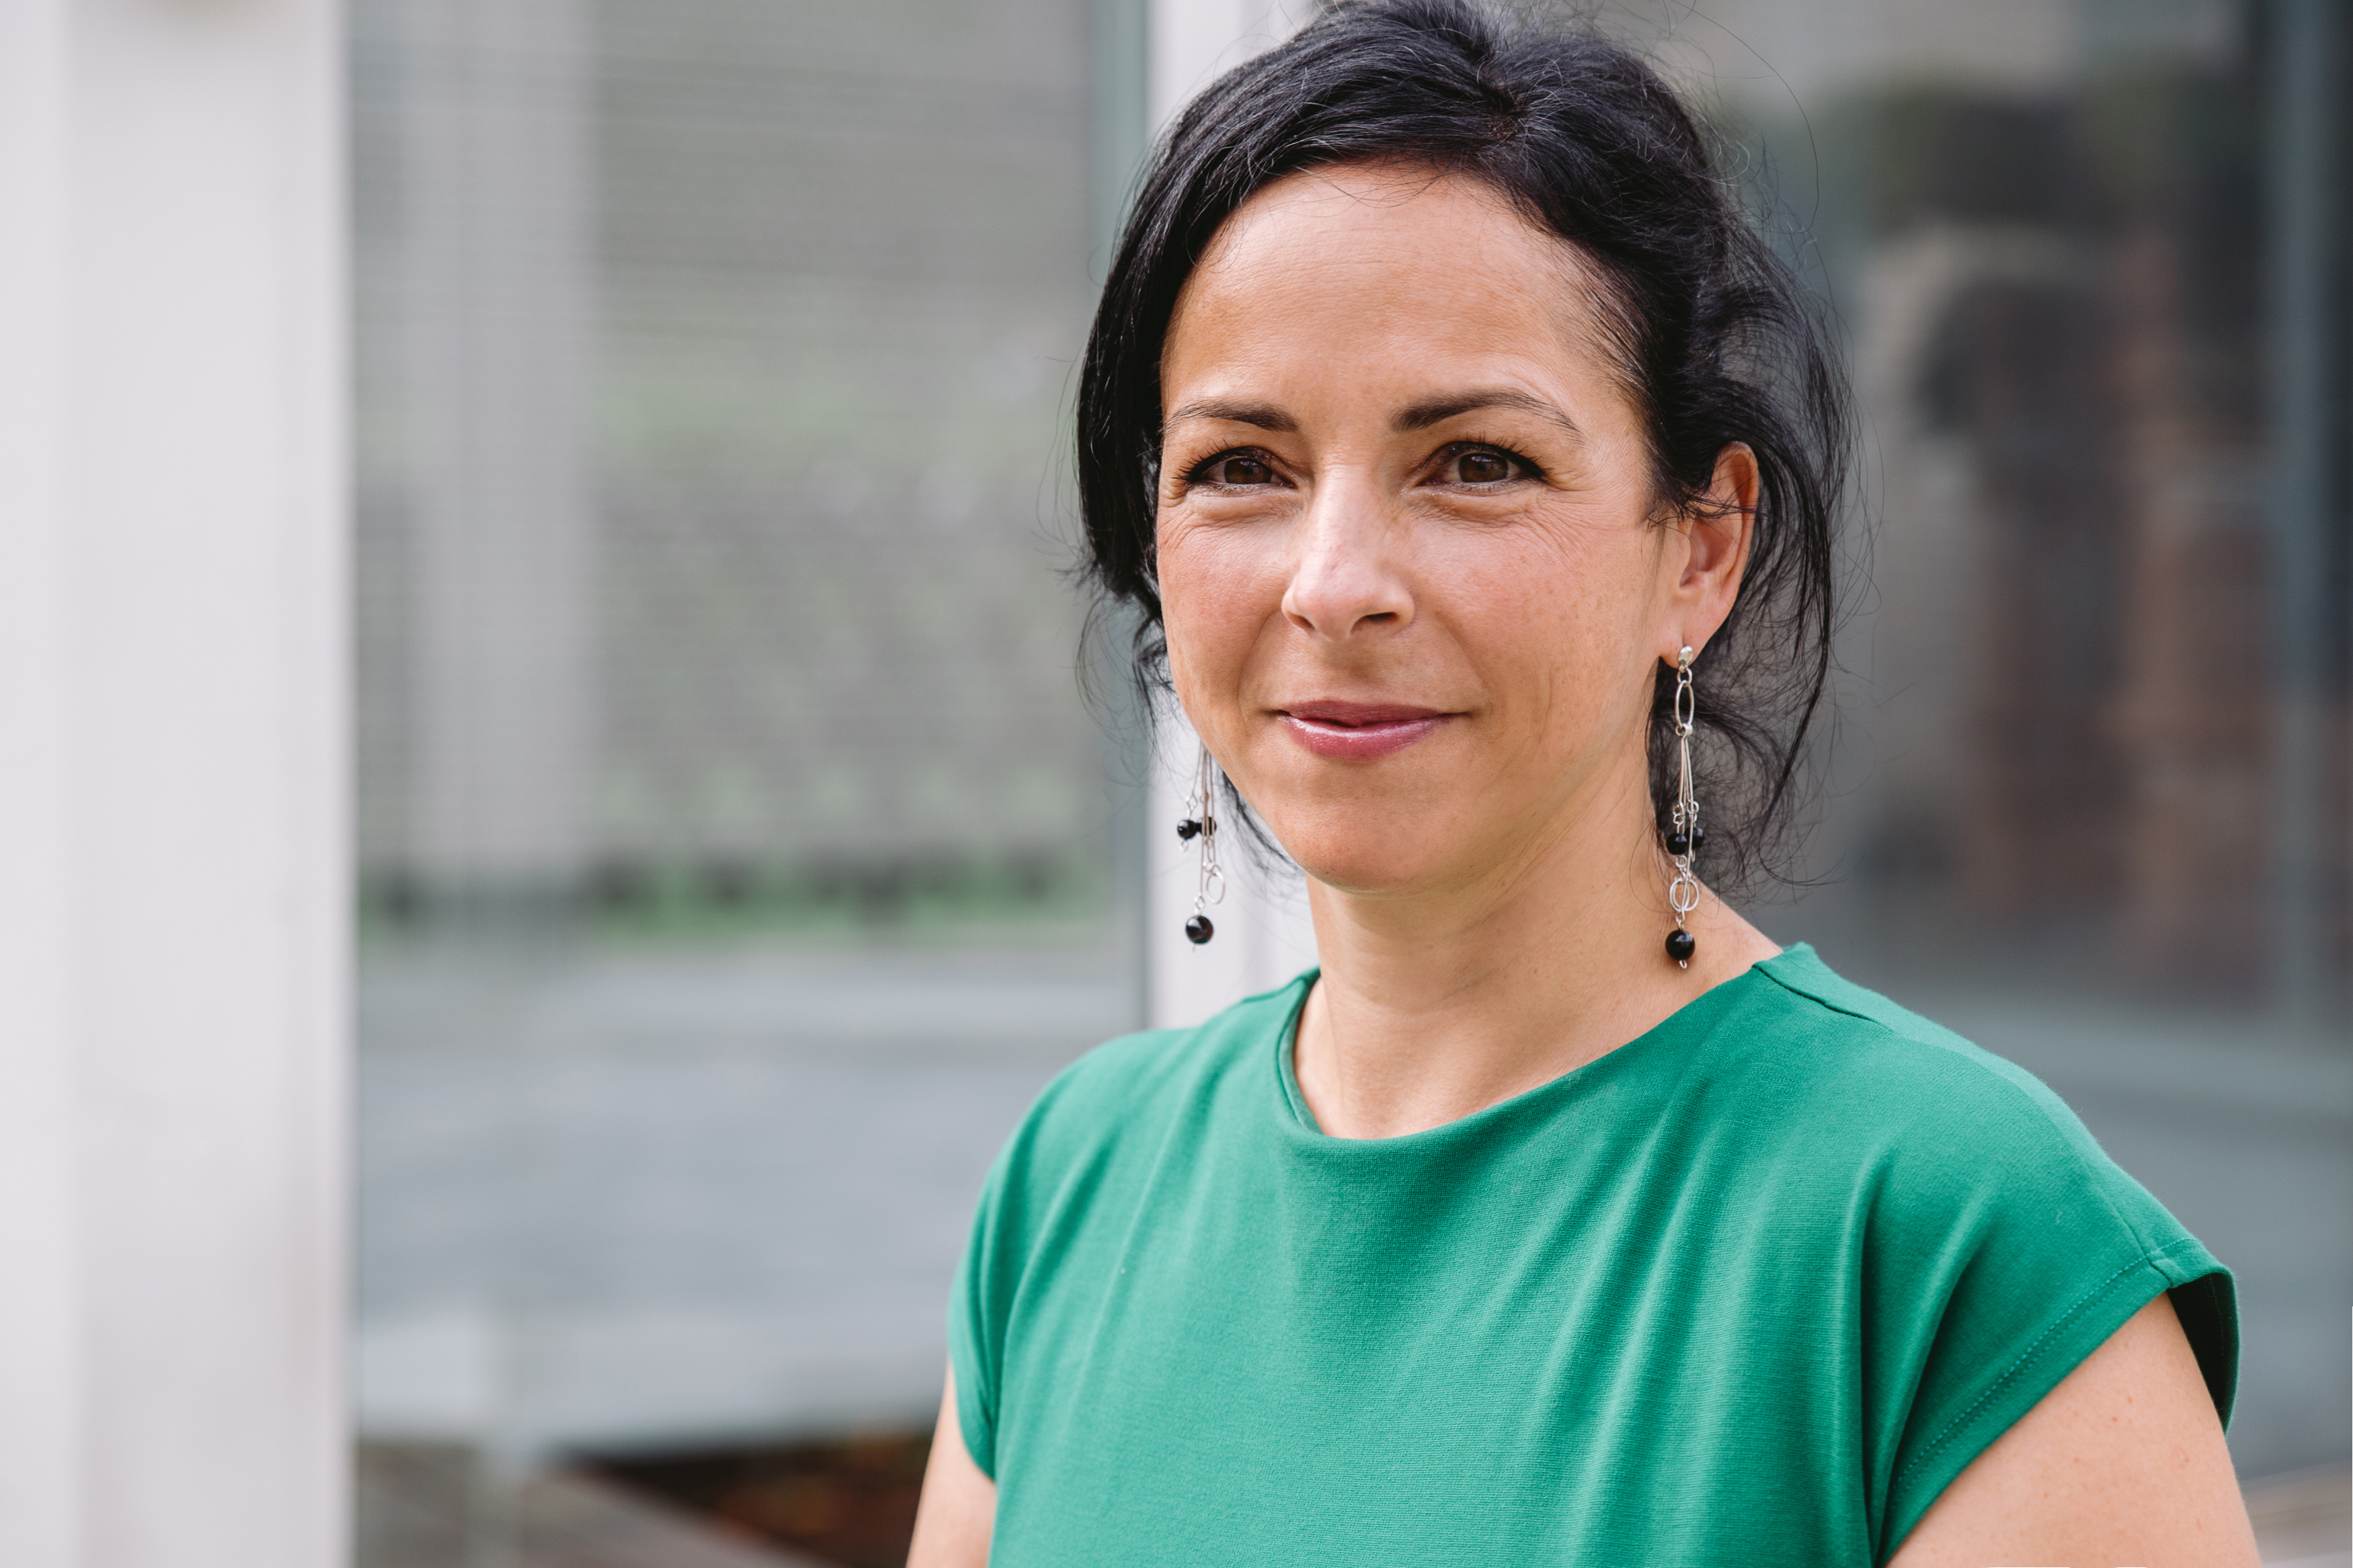 2-es típusú cukorbetegség - Dr. Bajnok Éva